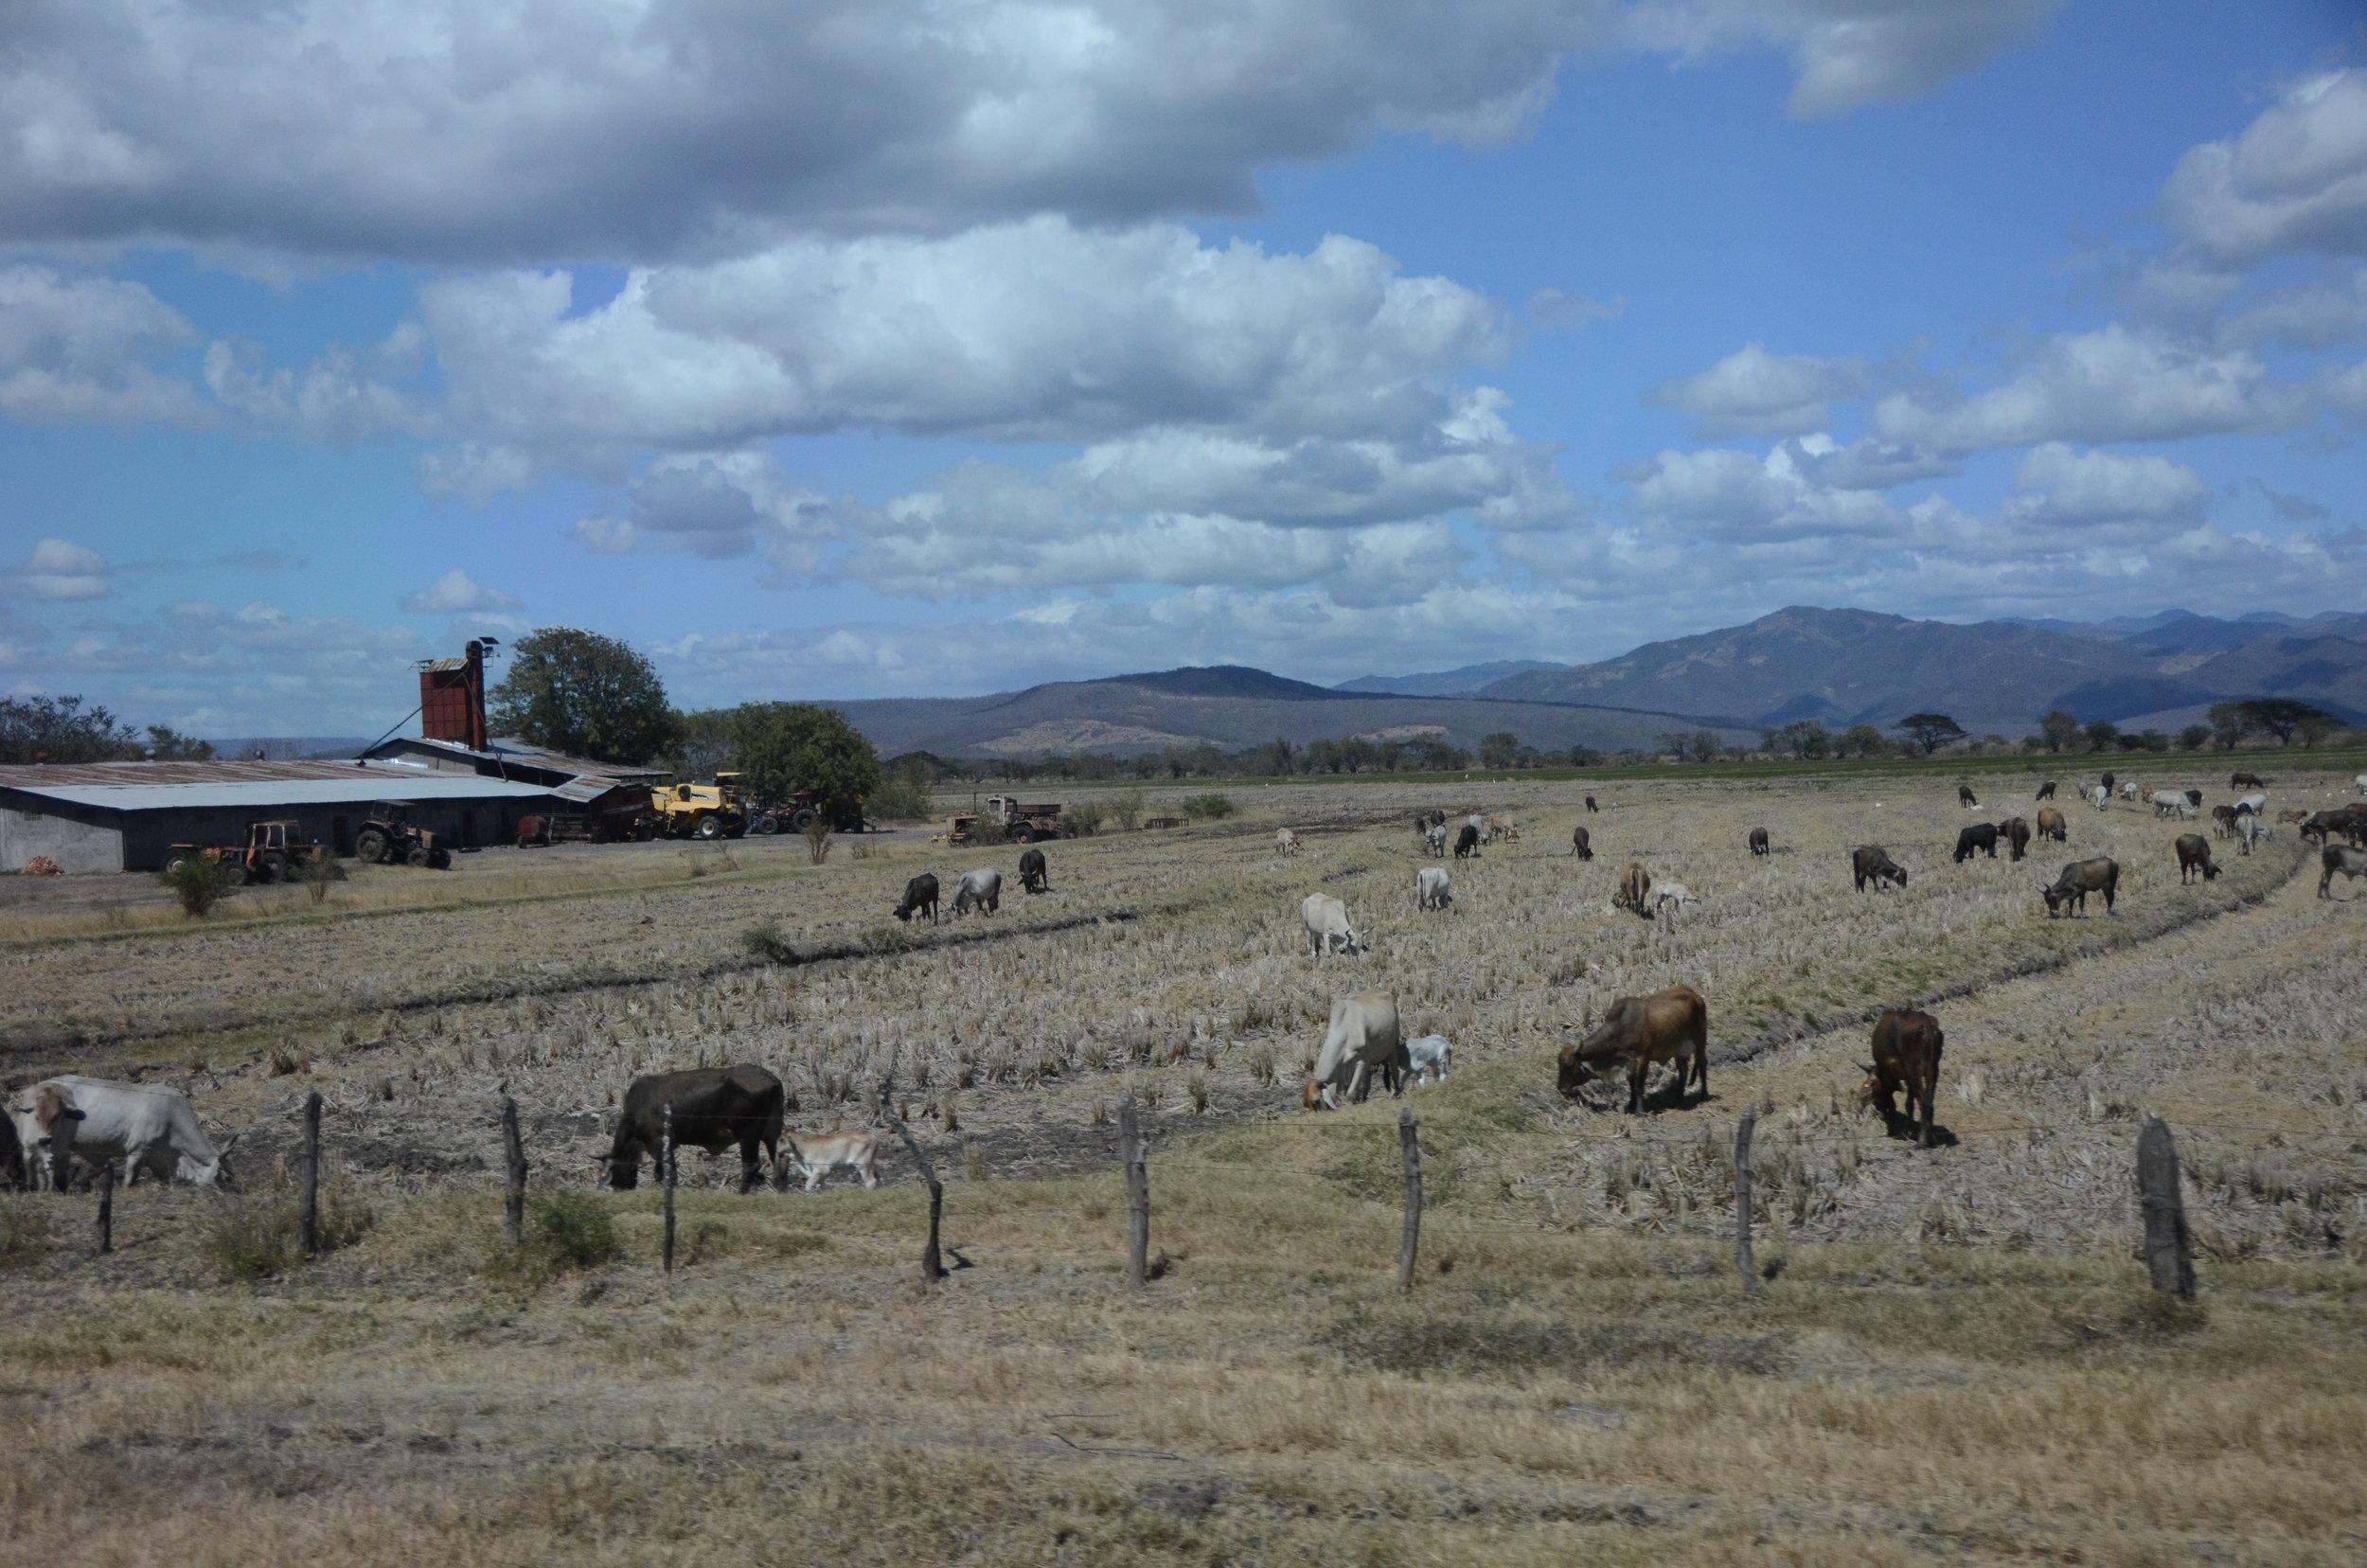 Cattle farm I think?